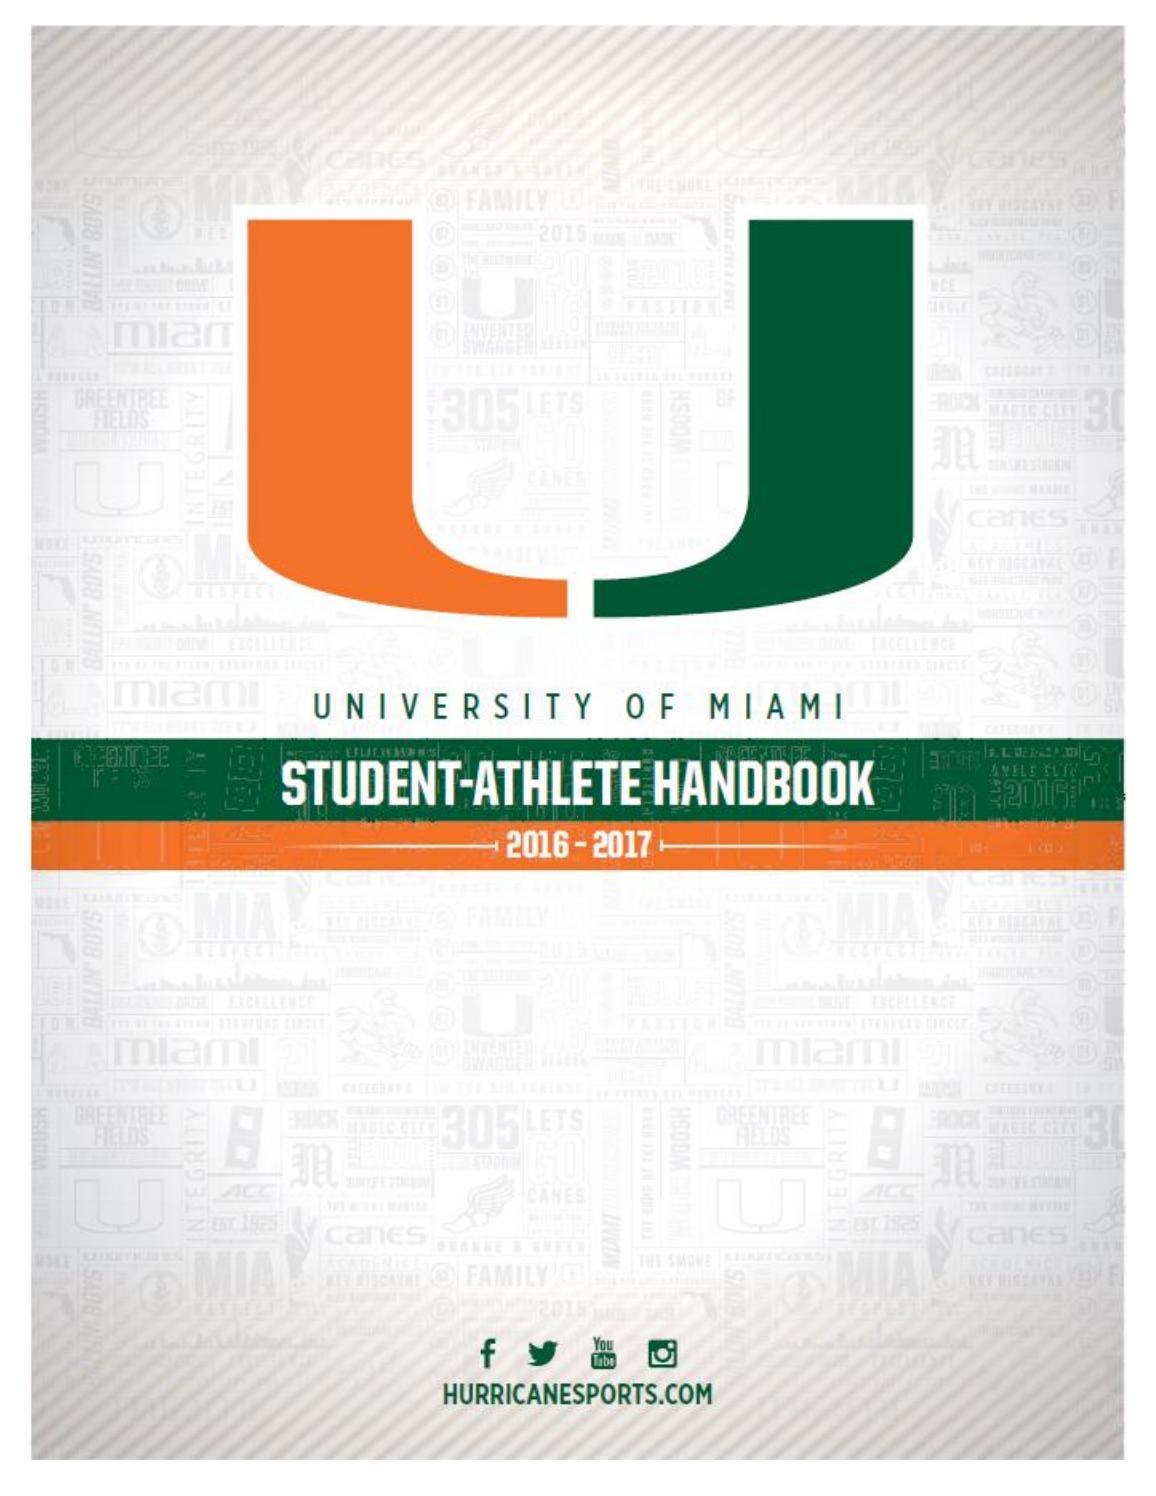 2016-17 Student-Athlete Handbook by Miami Hurricanes - issuu